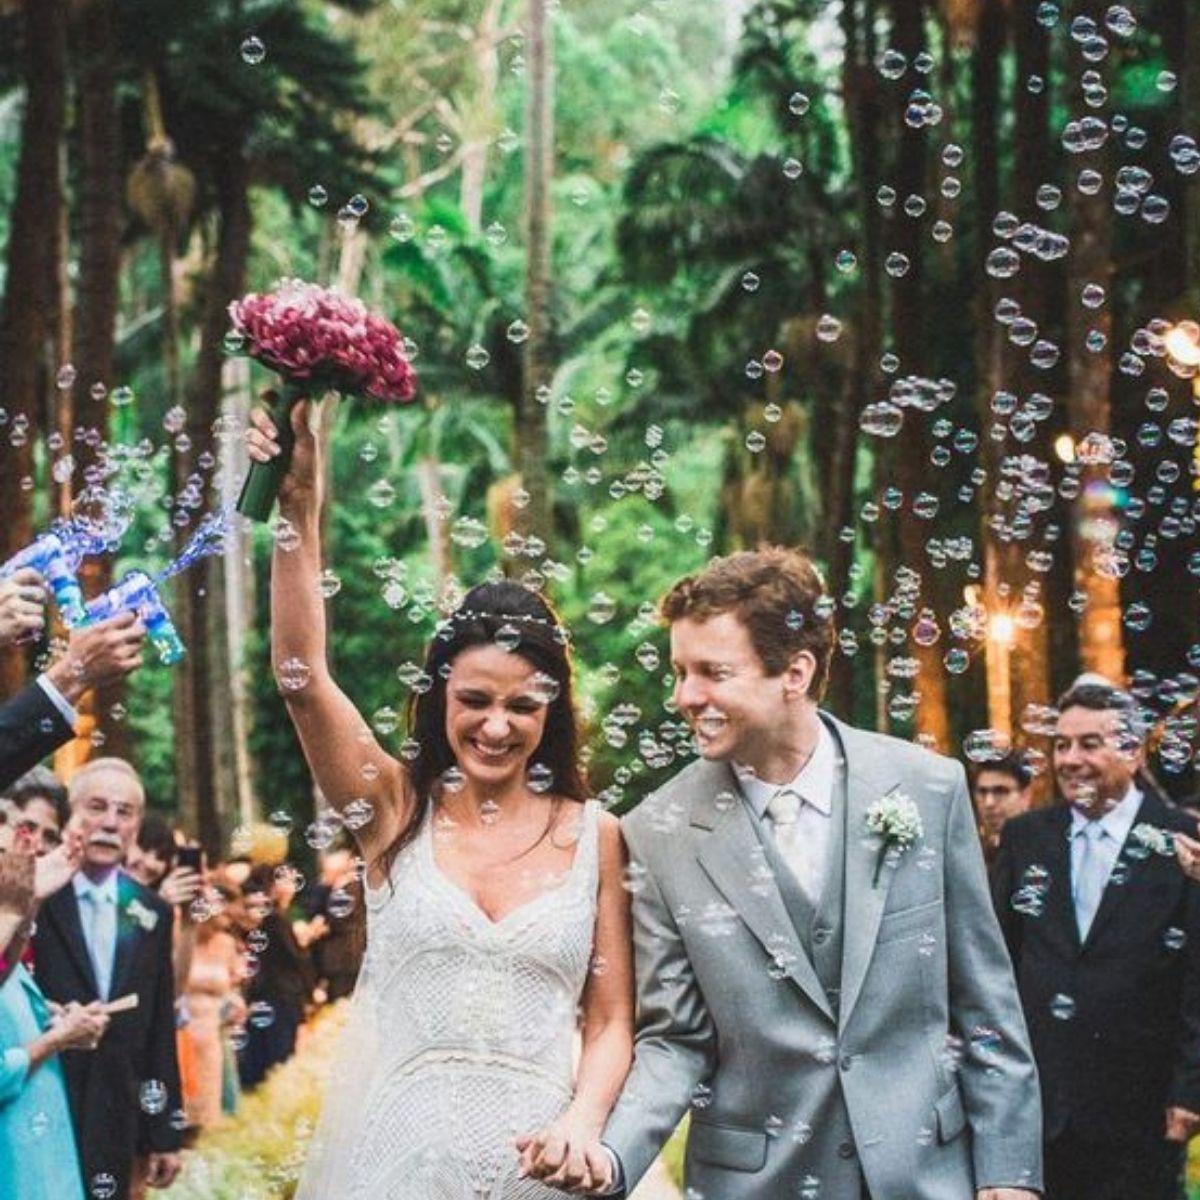 Creative and Fun Wedding Exit Send-off: bubbles